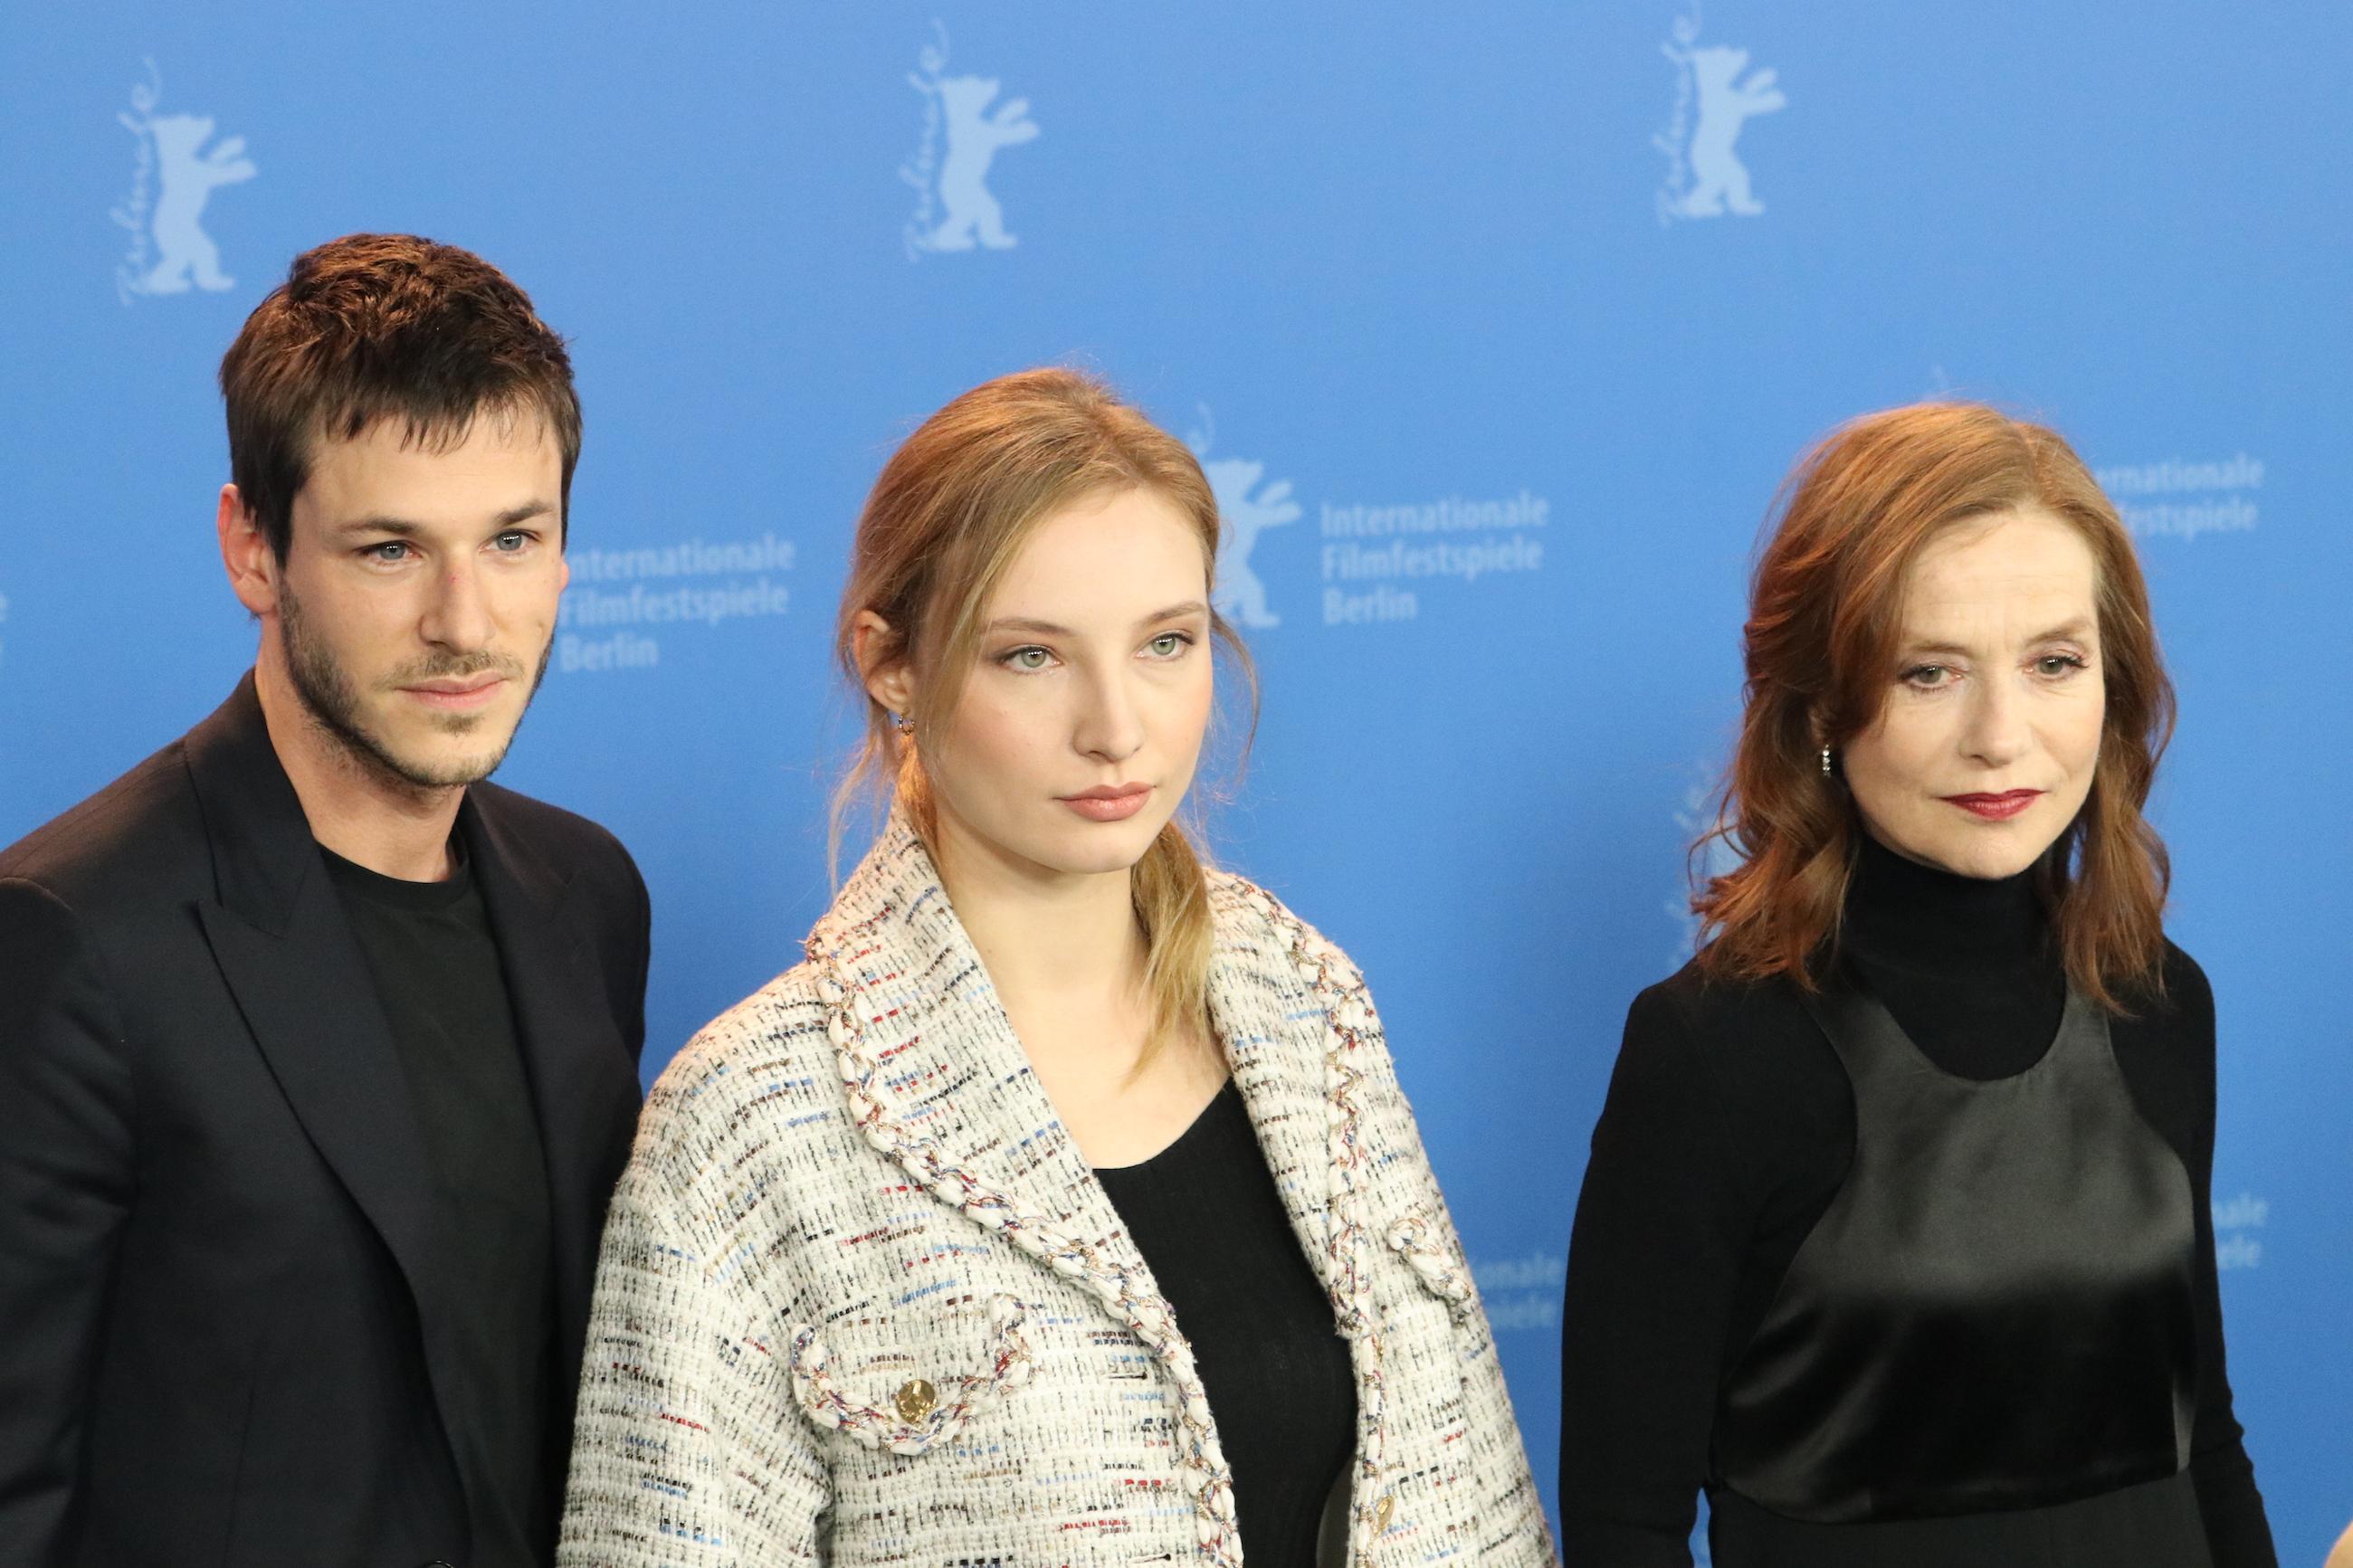 Berlino 2018: Isabelle Huppert, Gaspard Ulliel e Julia Roy al photocall di Eva